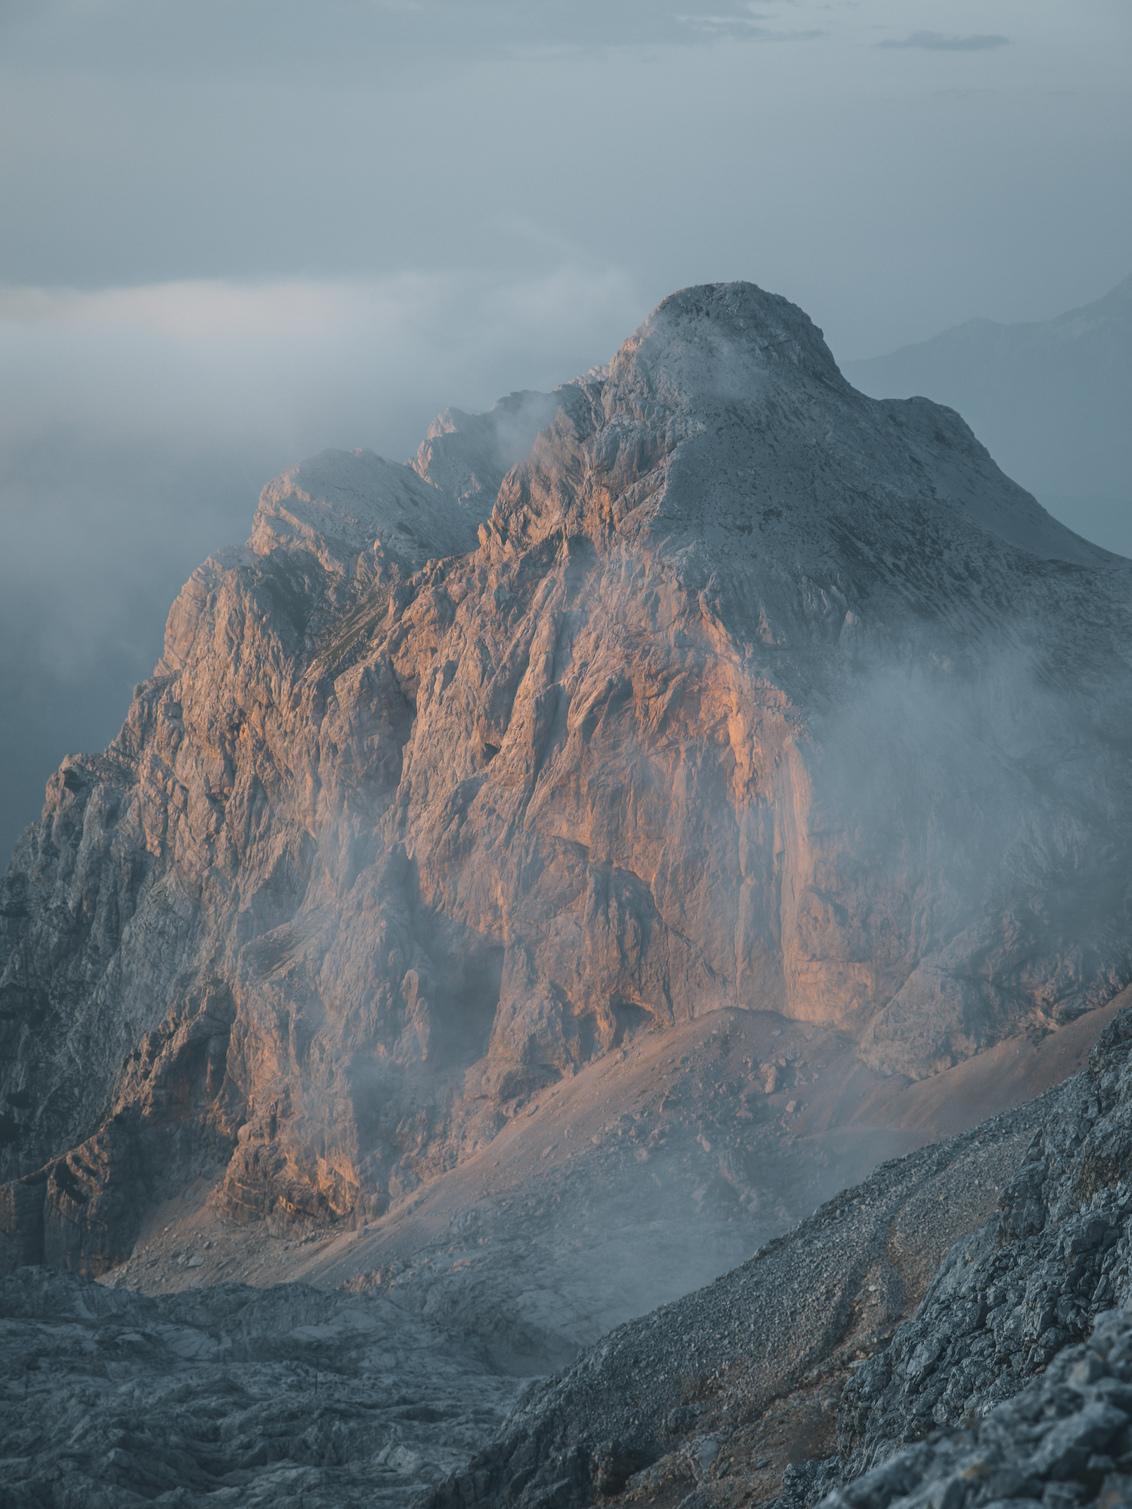 Mighty sunset. - Those last tones of the day make the mountains shine. Feel the alps - foto door canipel op 11-10-2019 - deze foto bevat: lucht, natuur, licht, avond, zonsondergang, landschap, mist, bergen, alpen, ruig, mood, triglav, slovenie